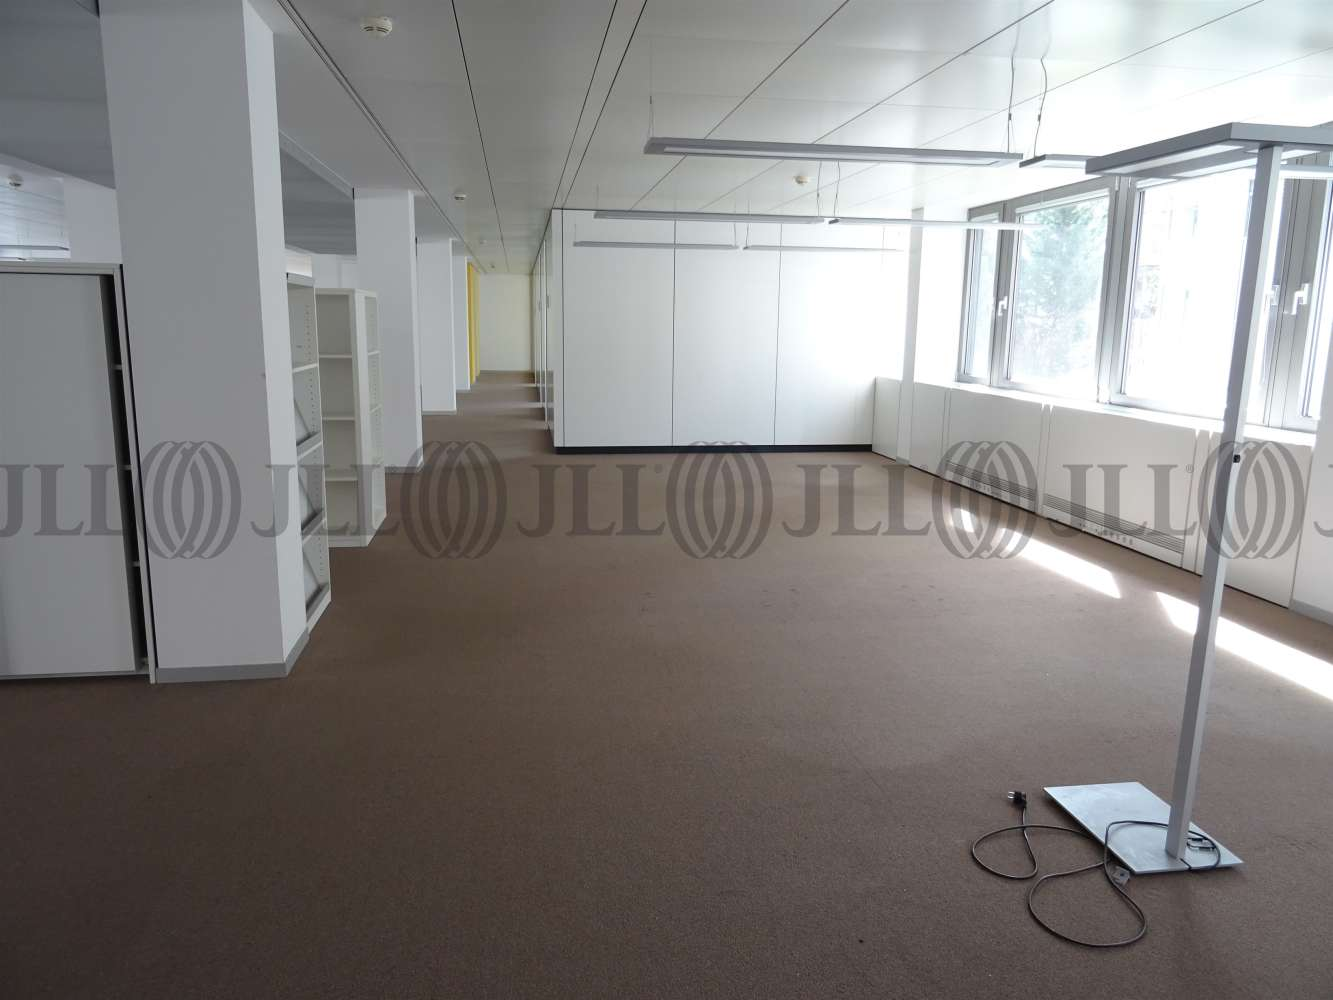 Büros Frankfurt am main, 60325 - Büro - Frankfurt am Main - F0633 - 10030221